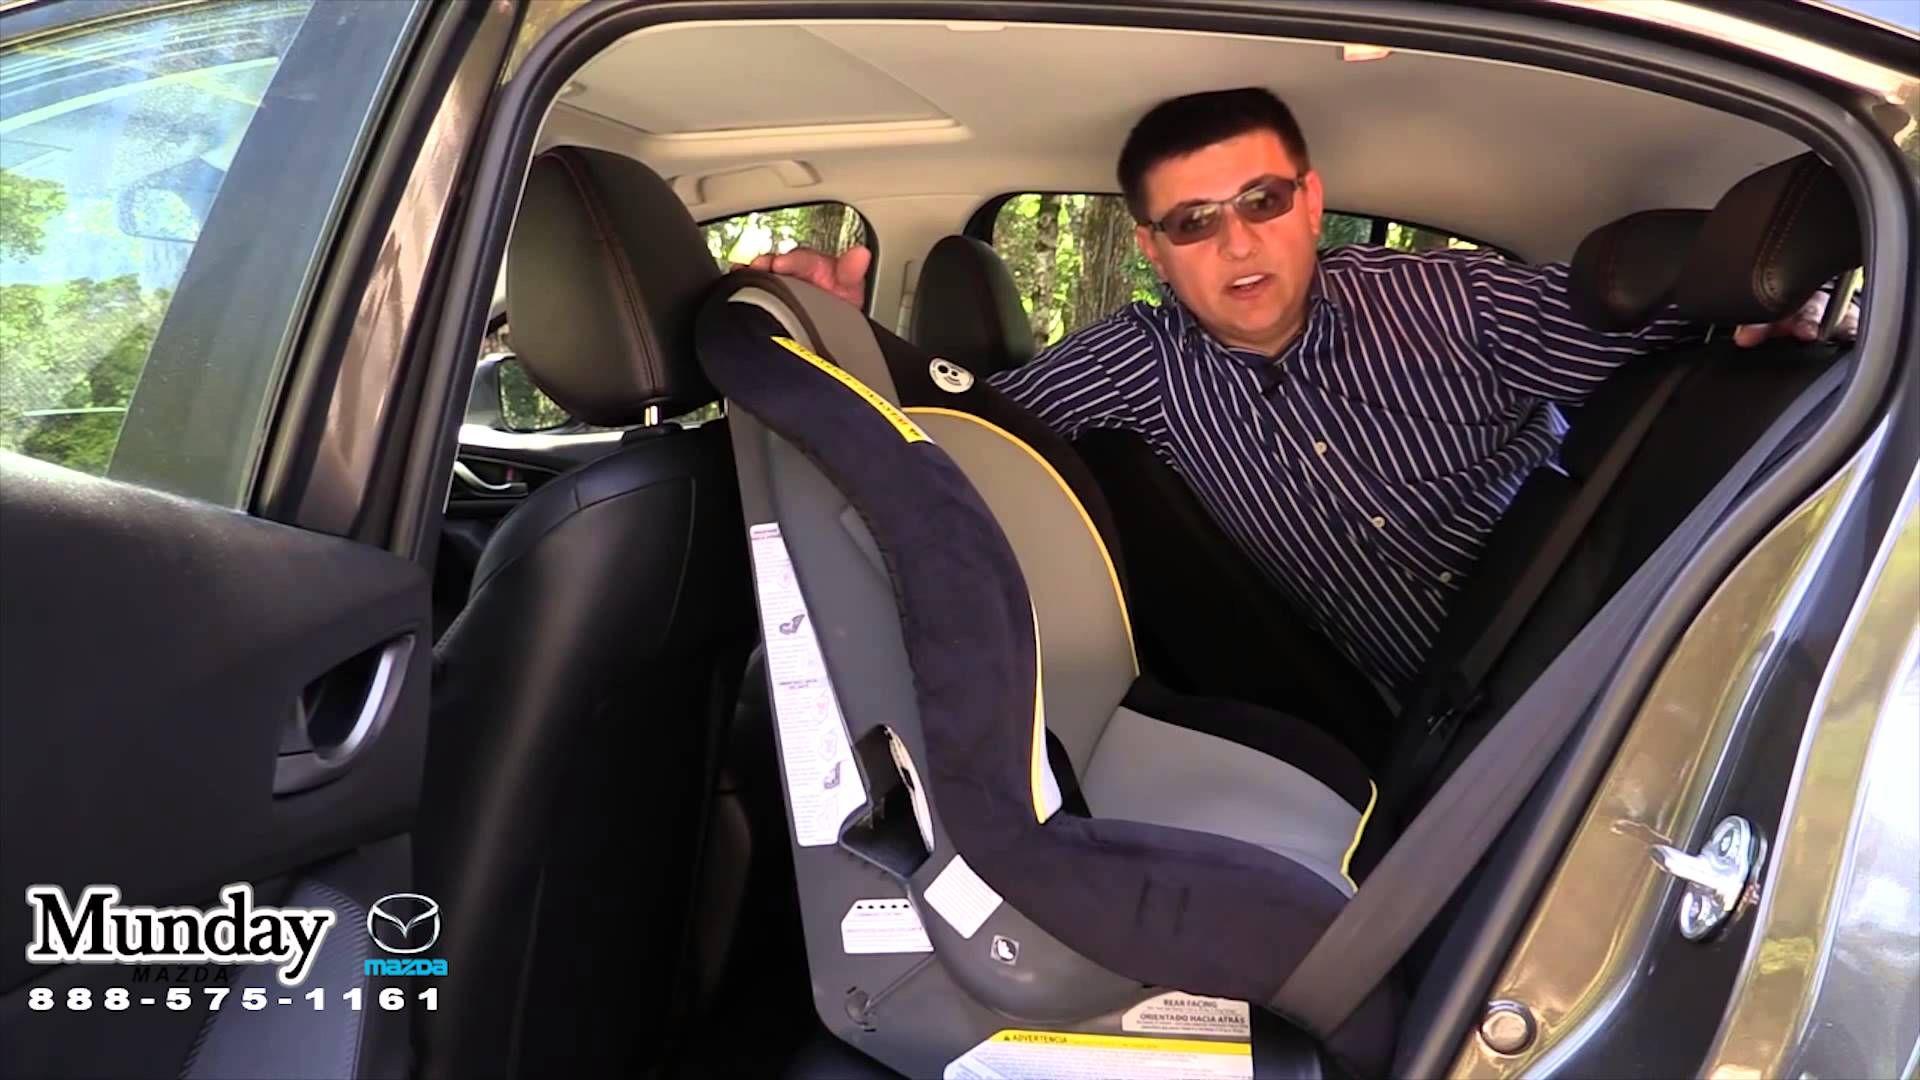 Lease New Mazda3 Woodlands , TX 2014 2015 Mazda3